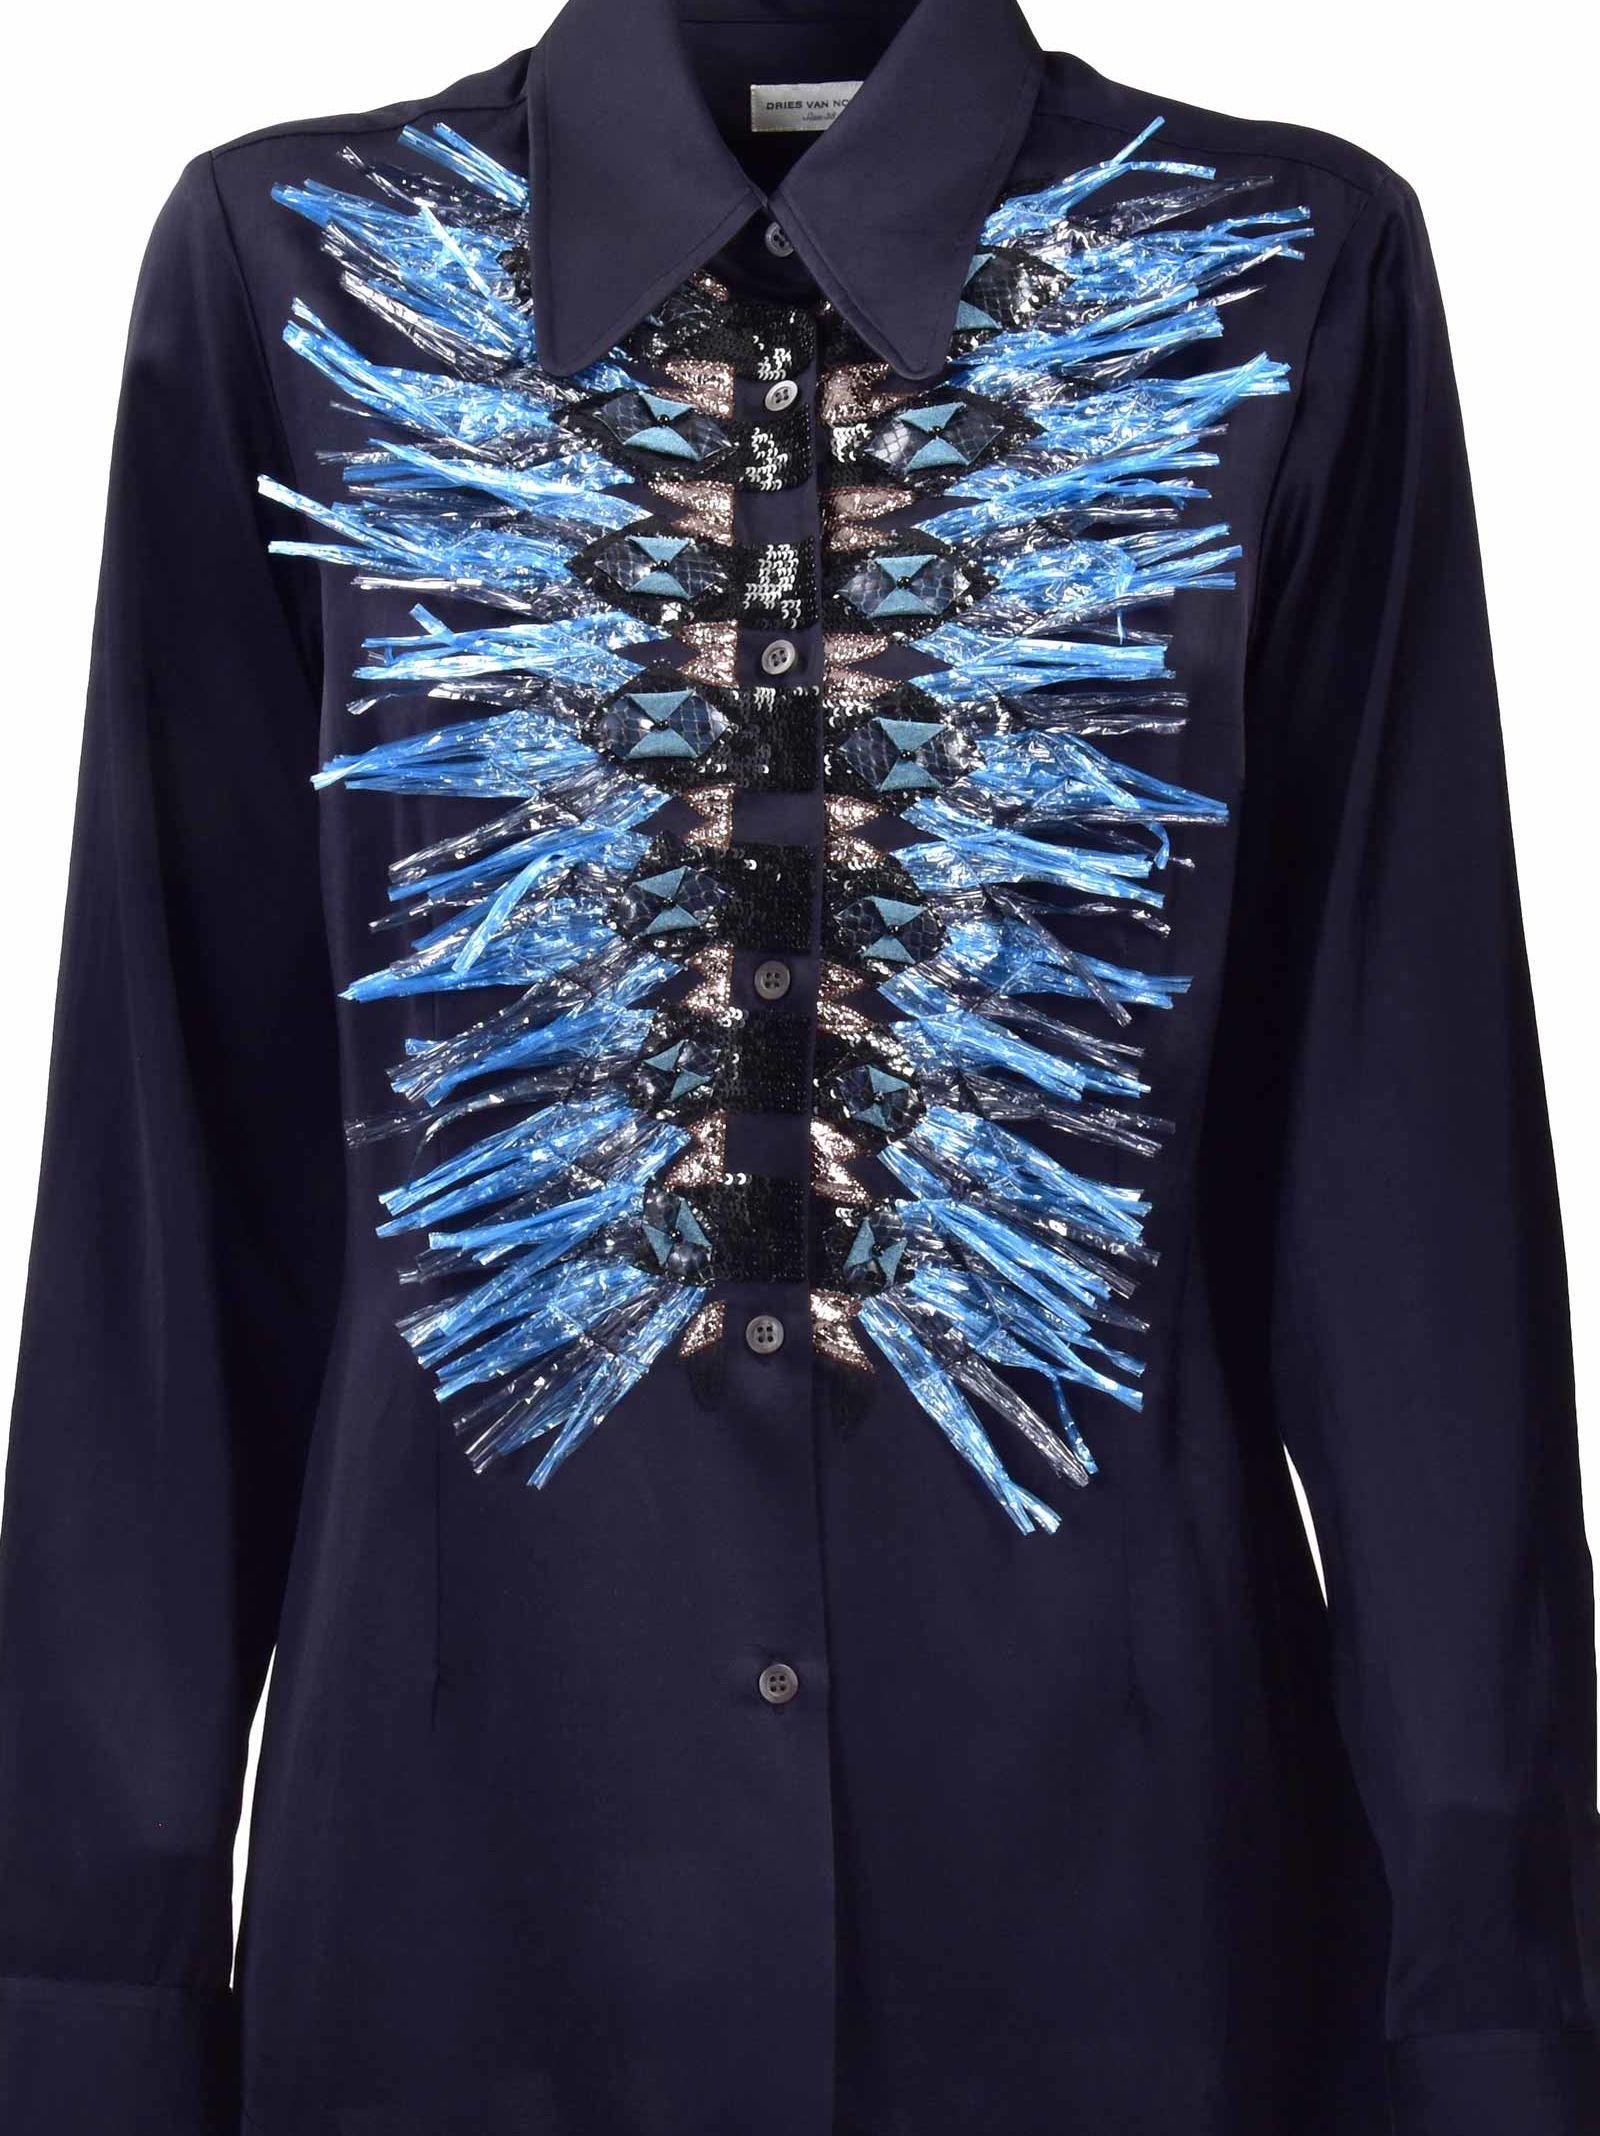 Dries Van Noten Embellished Placket Shirt